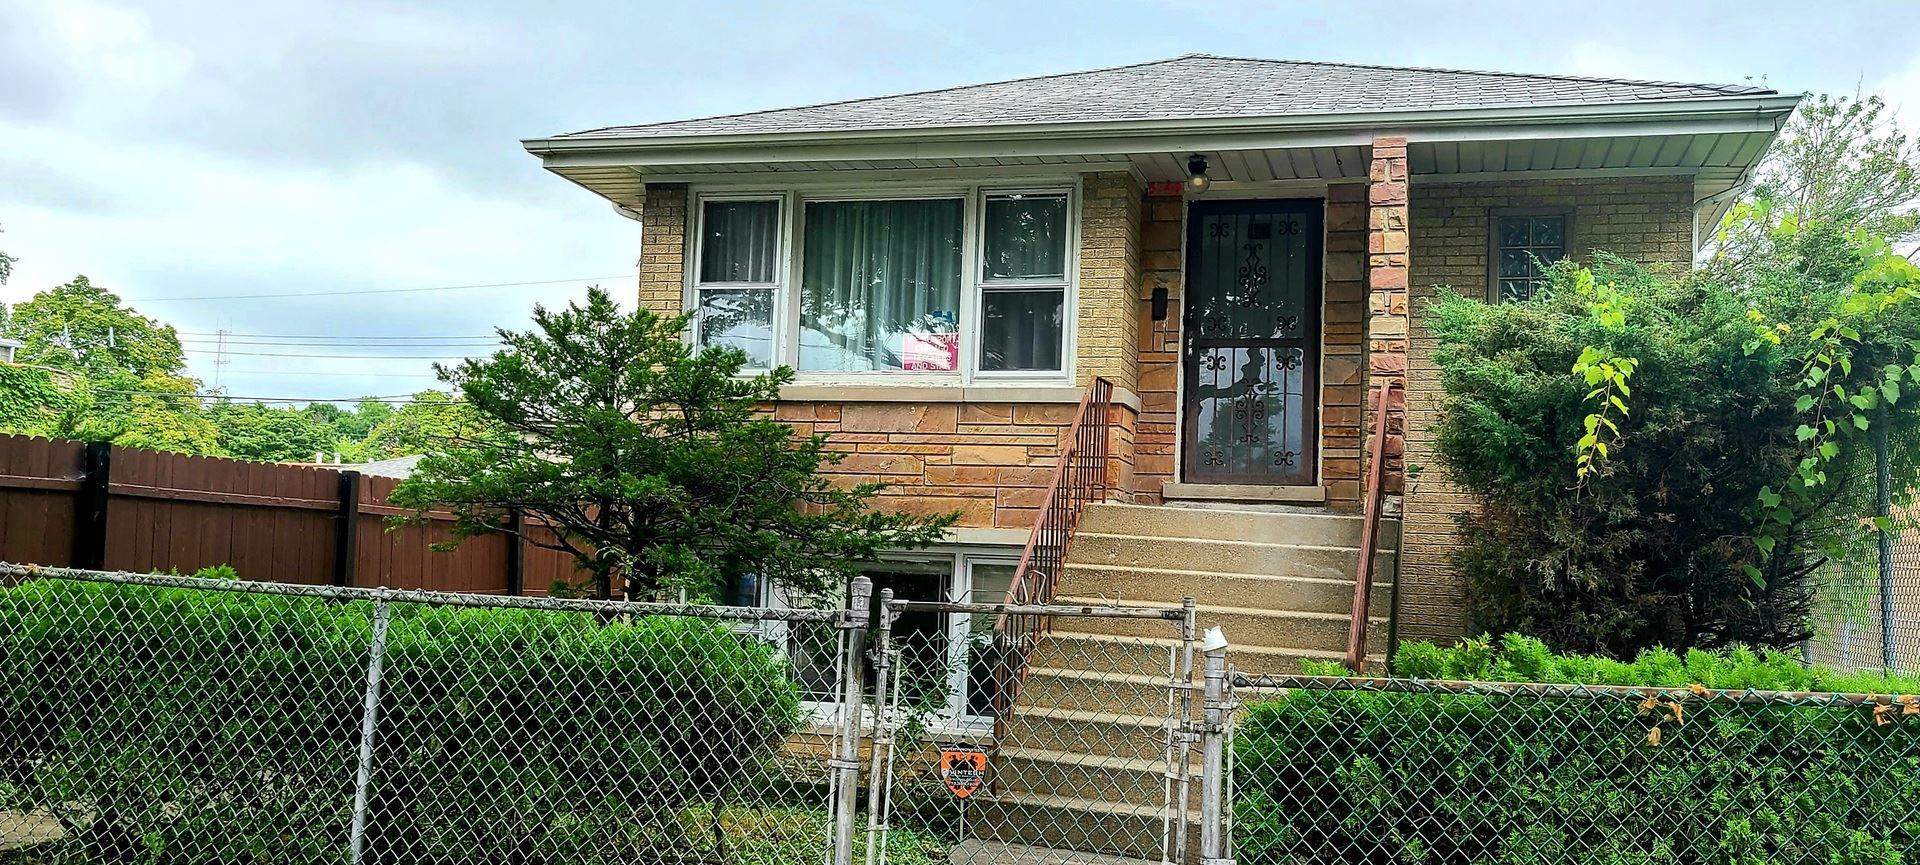 5340 W Bloomingdale Avenue, Chicago, IL 60639 - #: 10806585